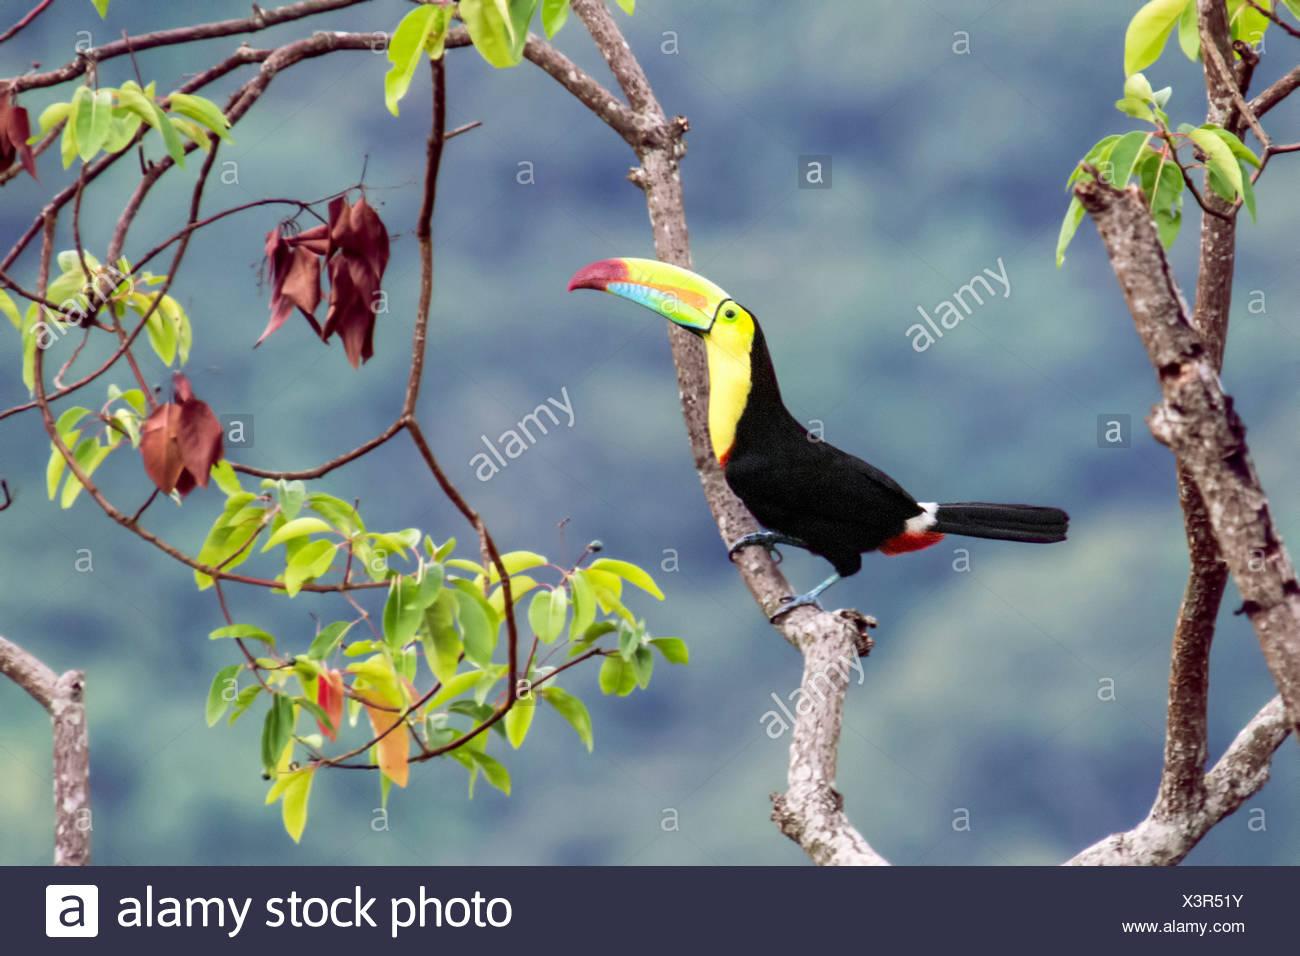 Keel-billed toucan, Ramphastos sulfuratus, Minca, Magdalena, Colombia - Stock Image